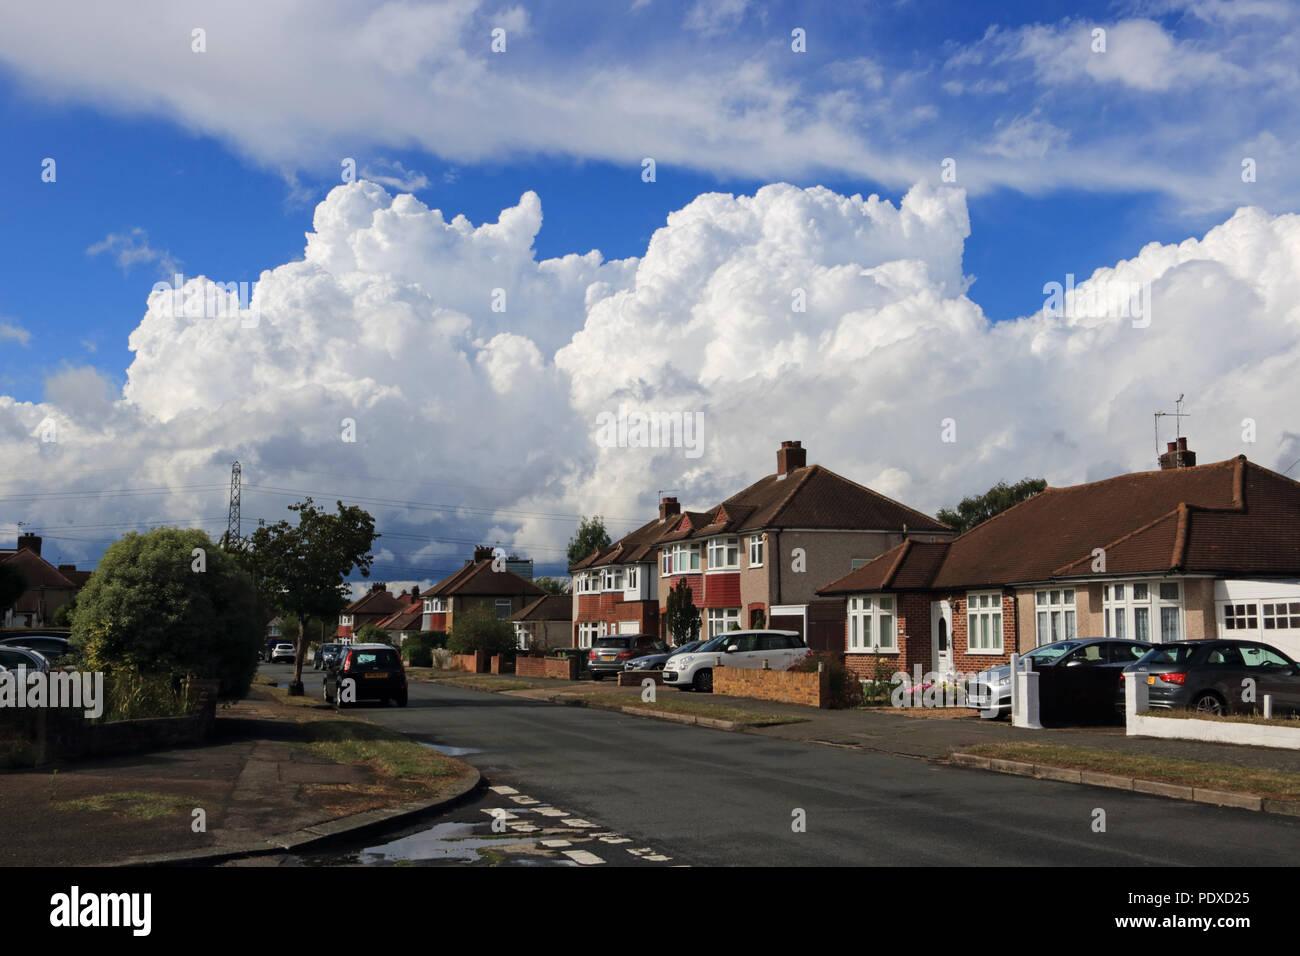 Epsom Surrey England UK. 10th August 2018. Towering cumulonimbus rain clouds fill the sky over a suburban street in Epsom Surrey. Credit: Julia Gavin/Alamy Live News - Stock Image